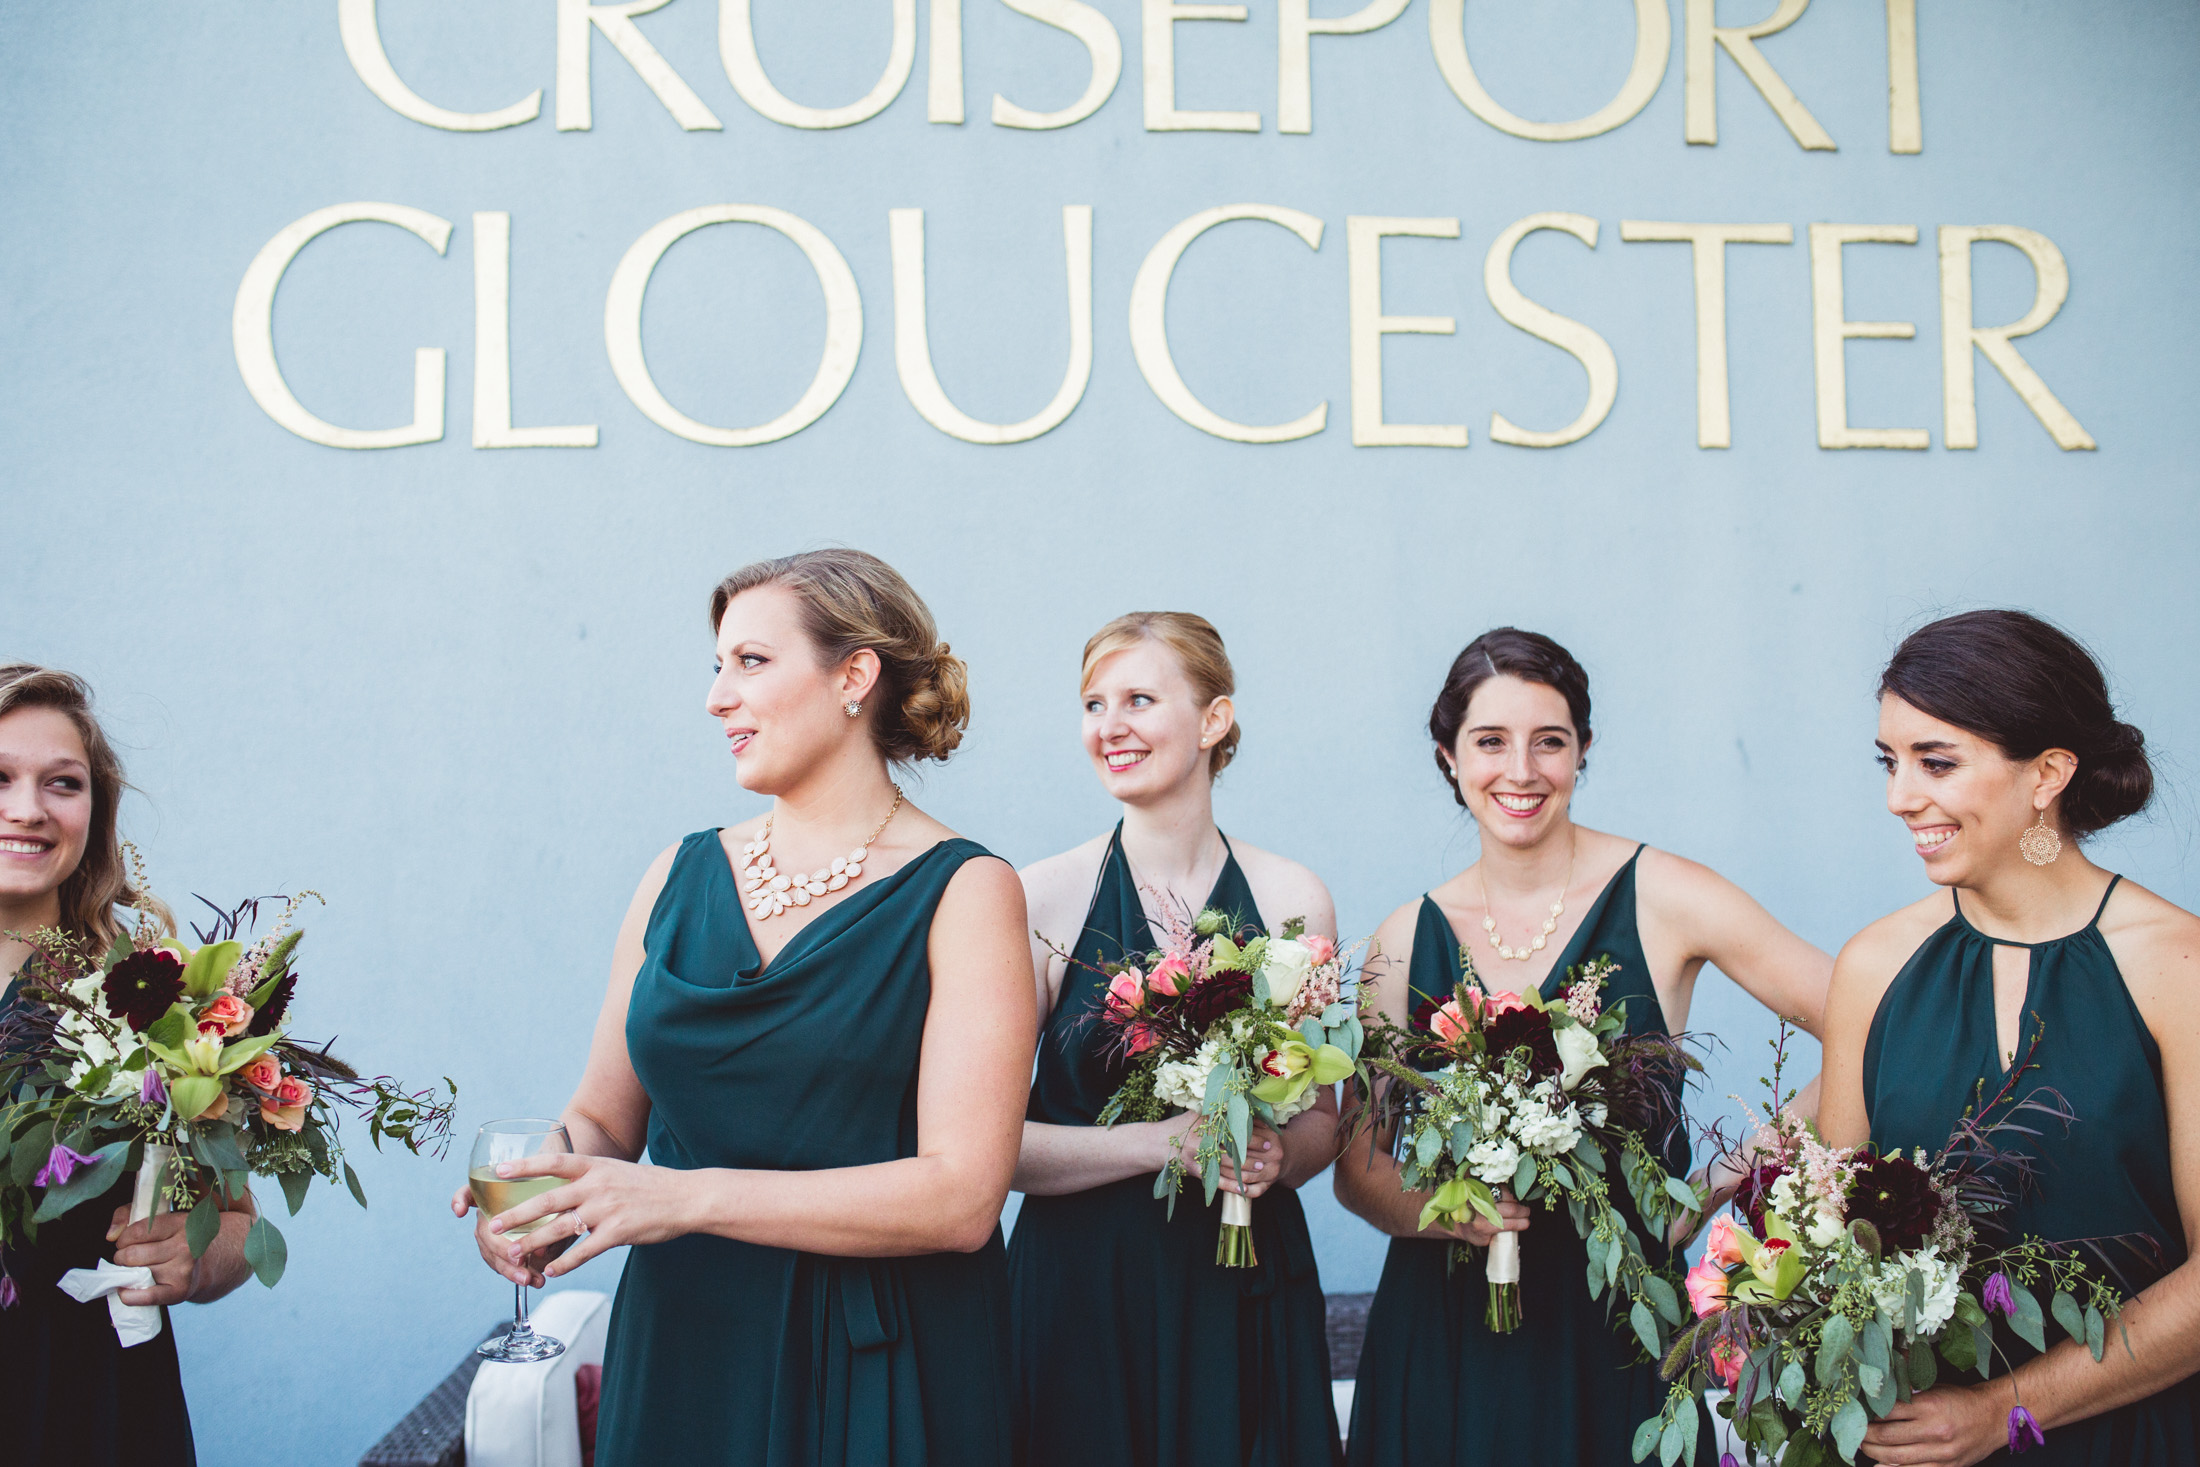 Cruiseport-Wedding-Photographer-25.jpg